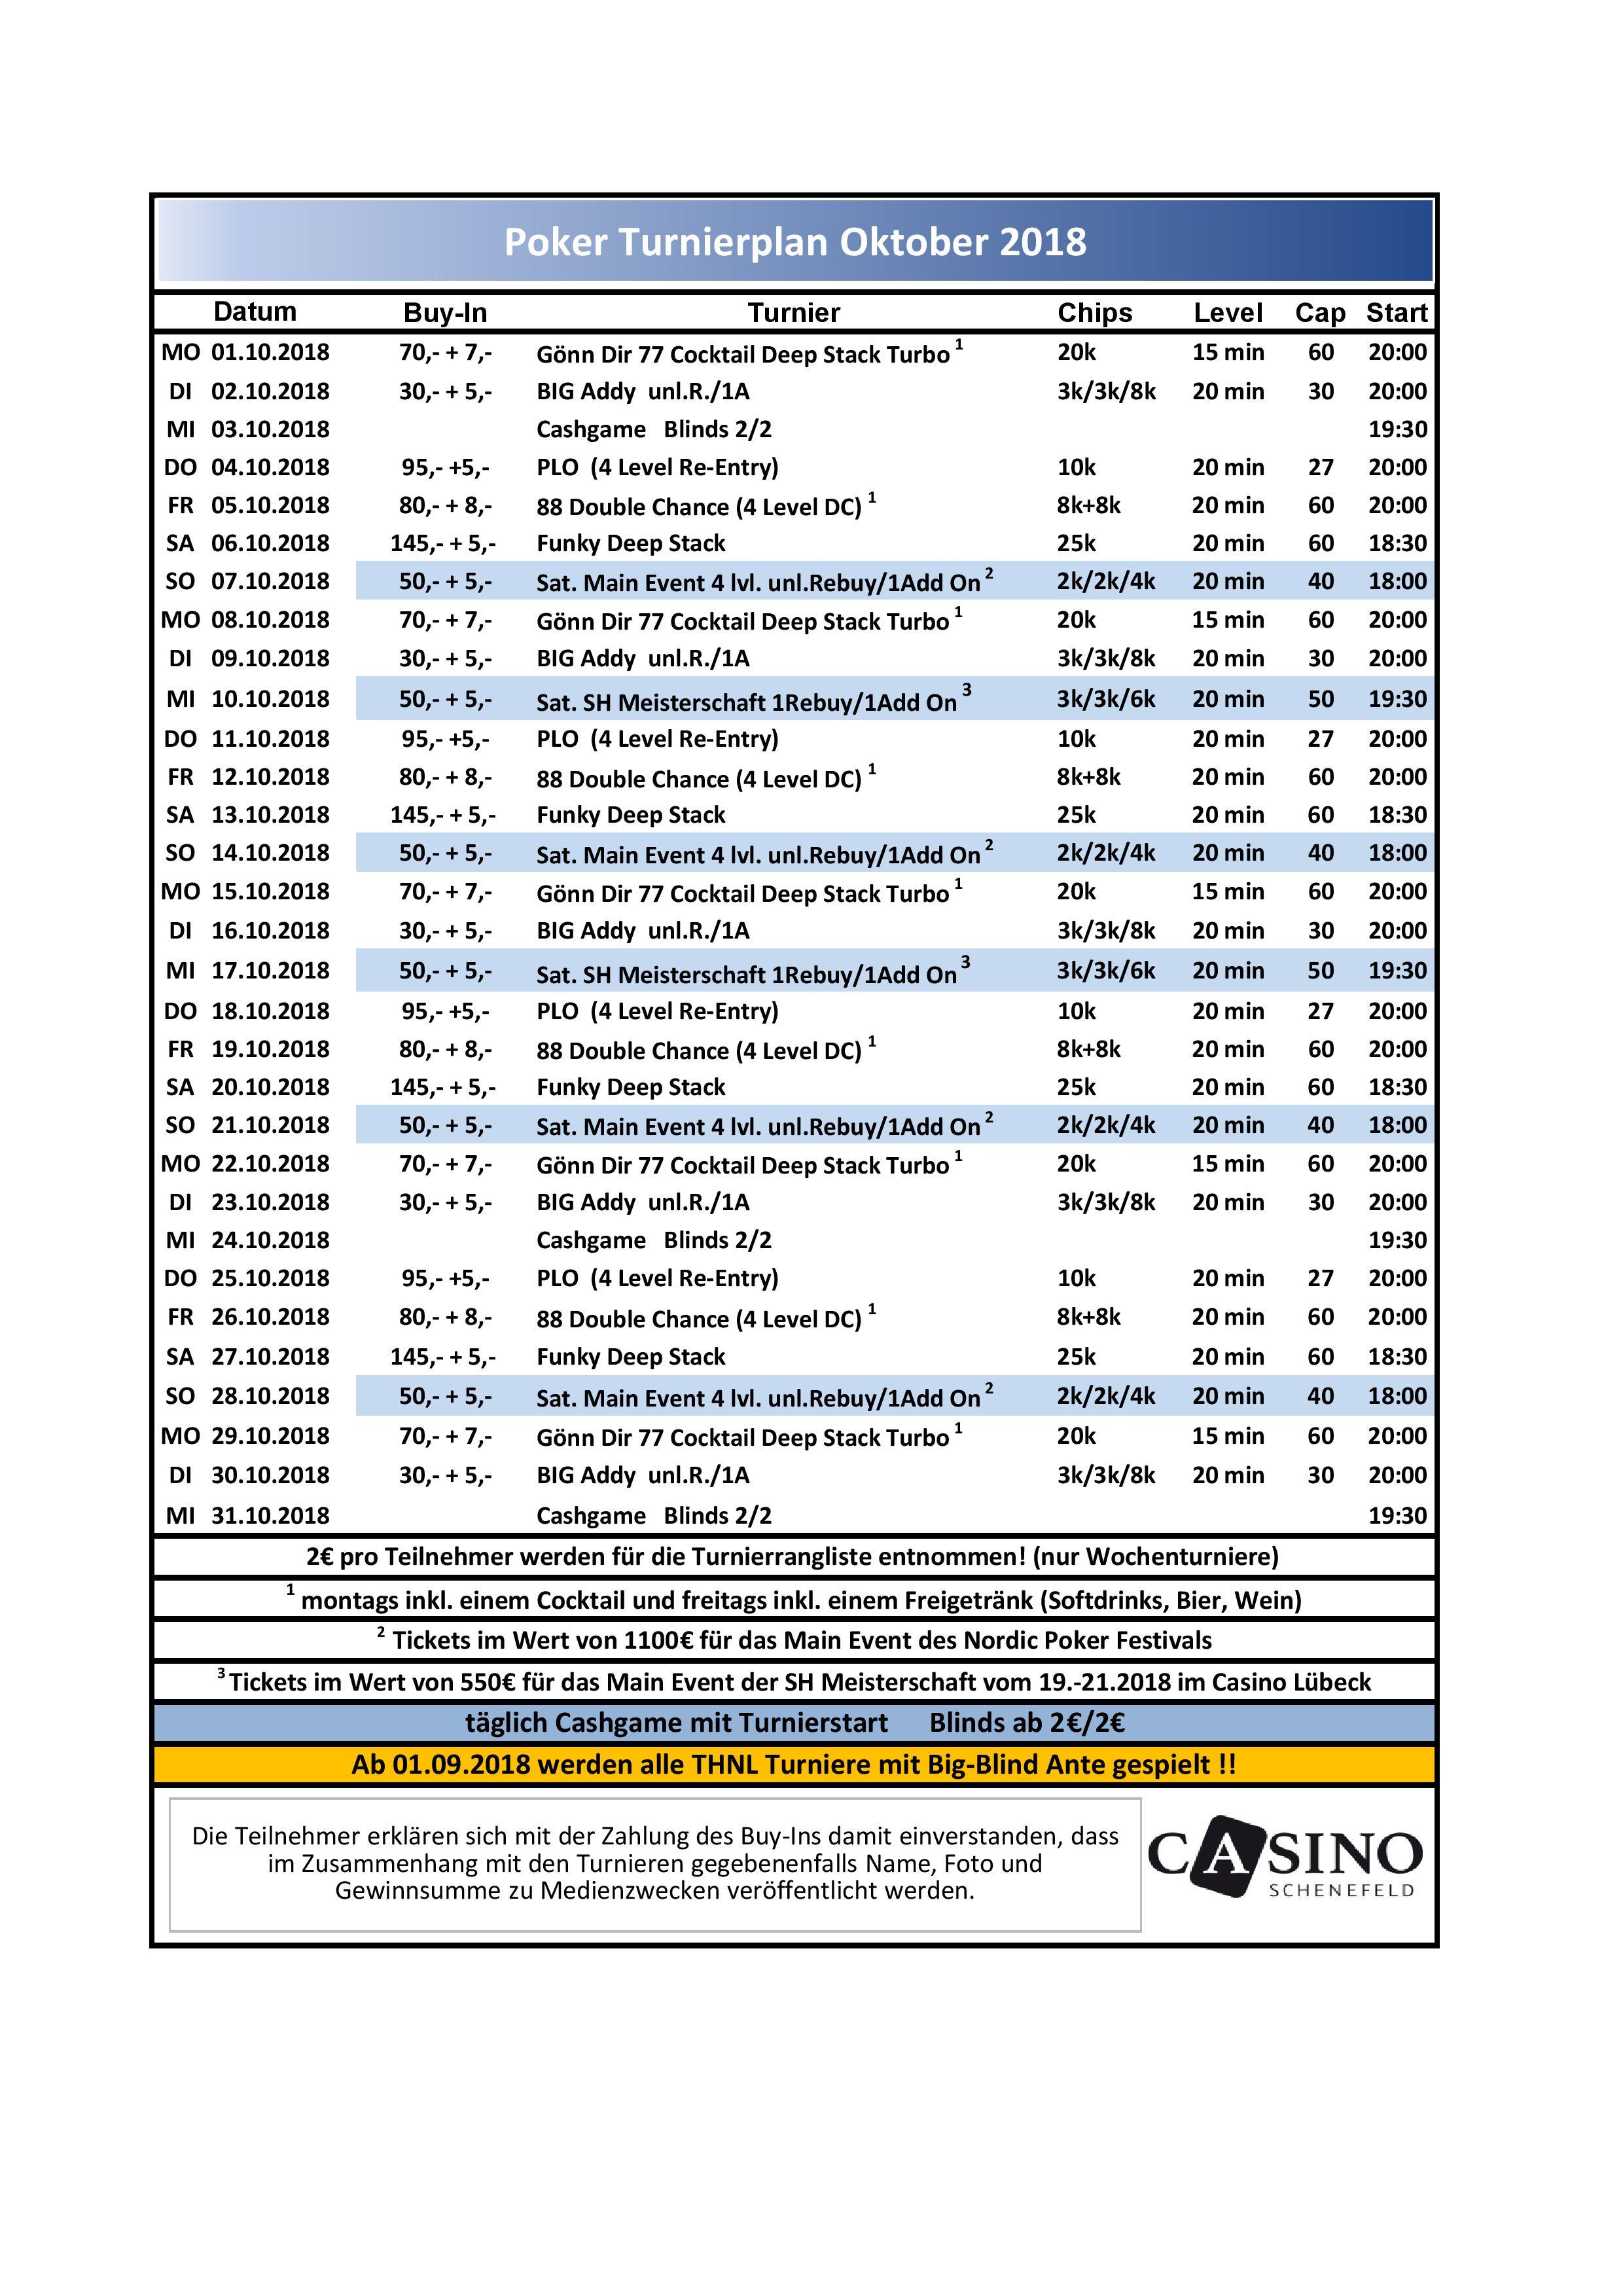 CSS Turnierplan Oktober